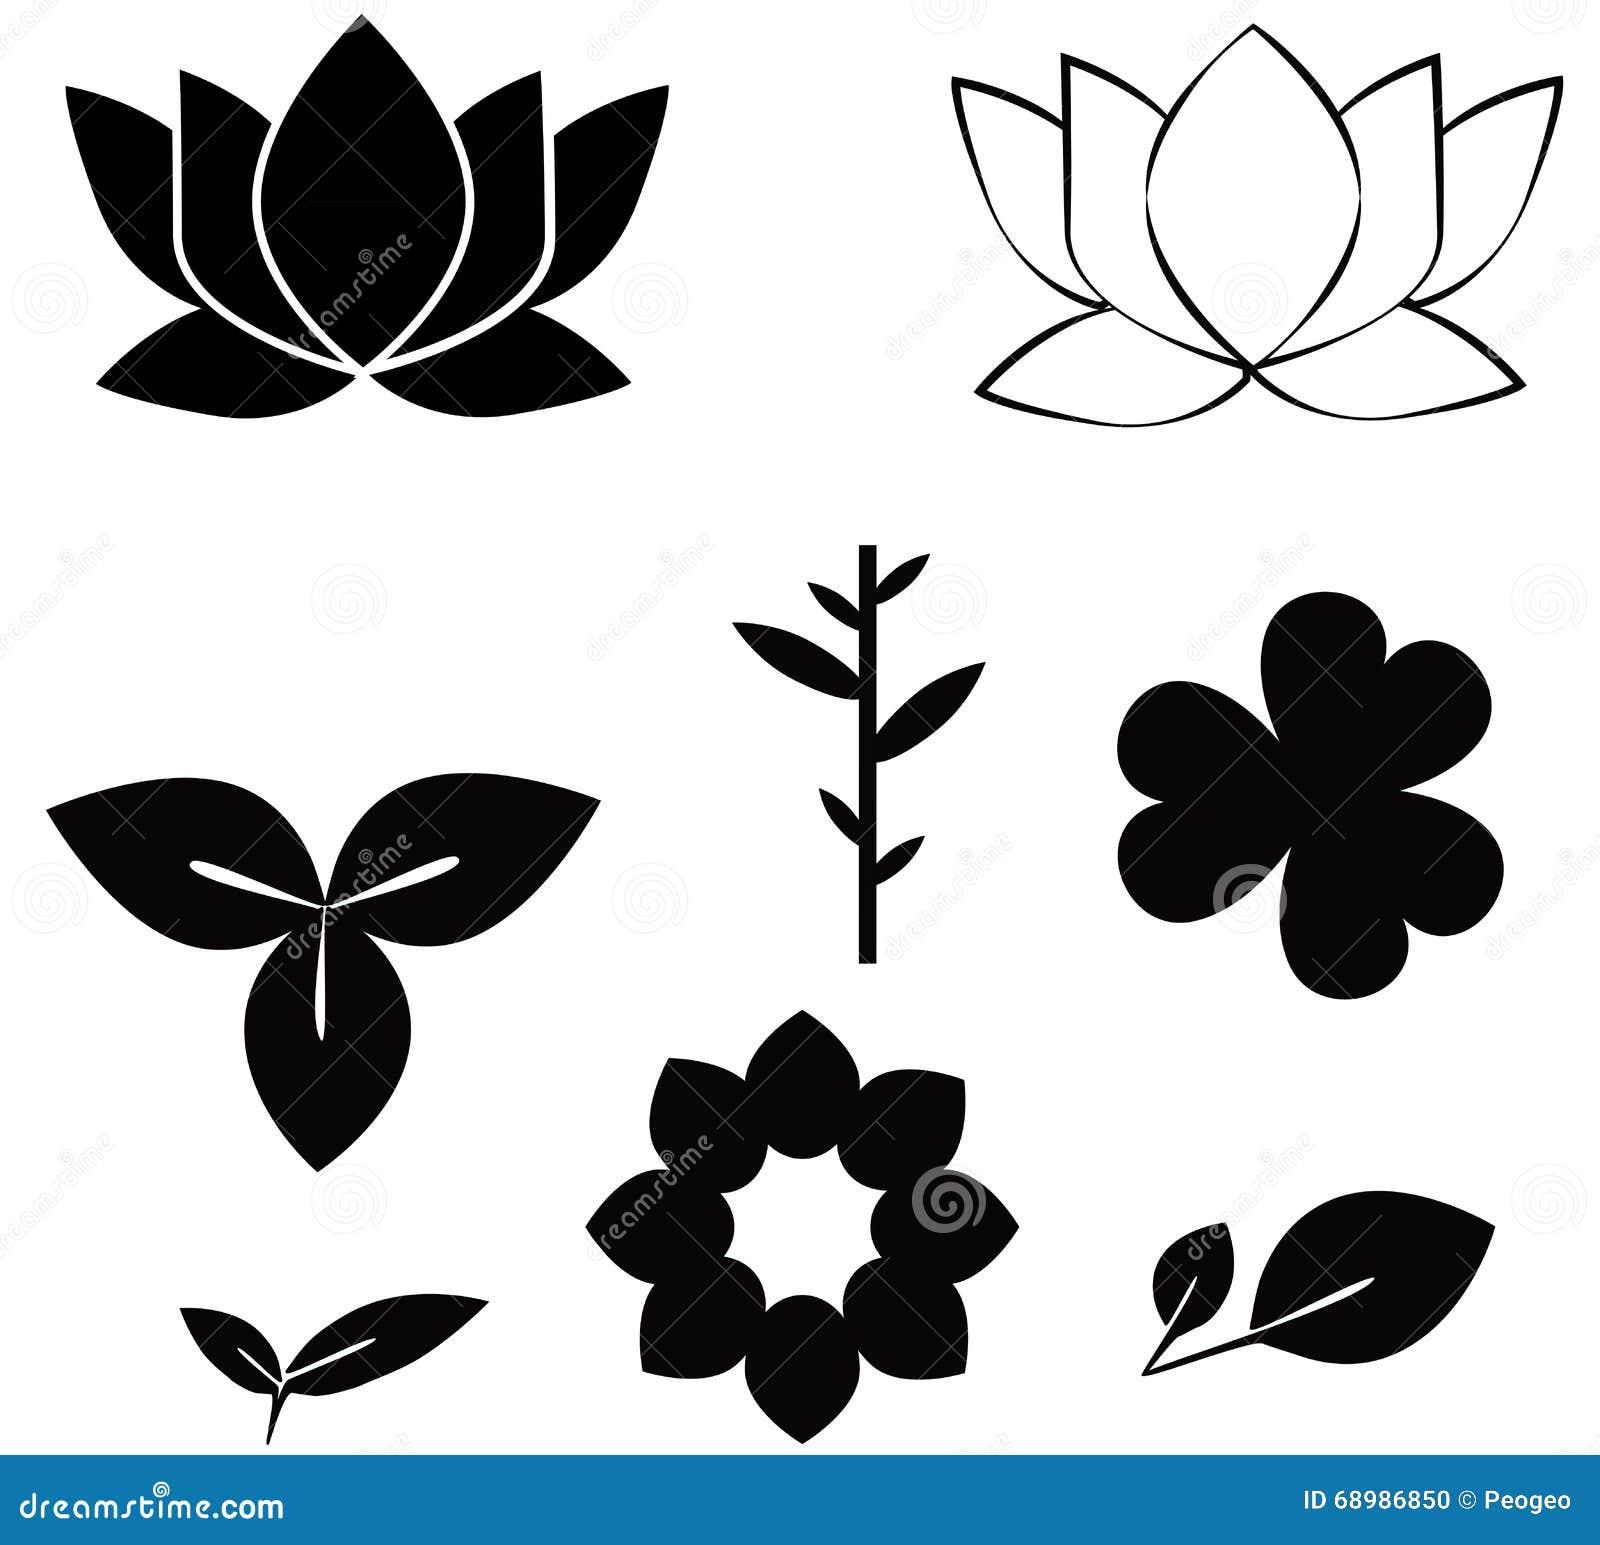 Flowers shape black silhouette set illustrations on w stock vector flowers shape black silhouette set illustrations on w mightylinksfo